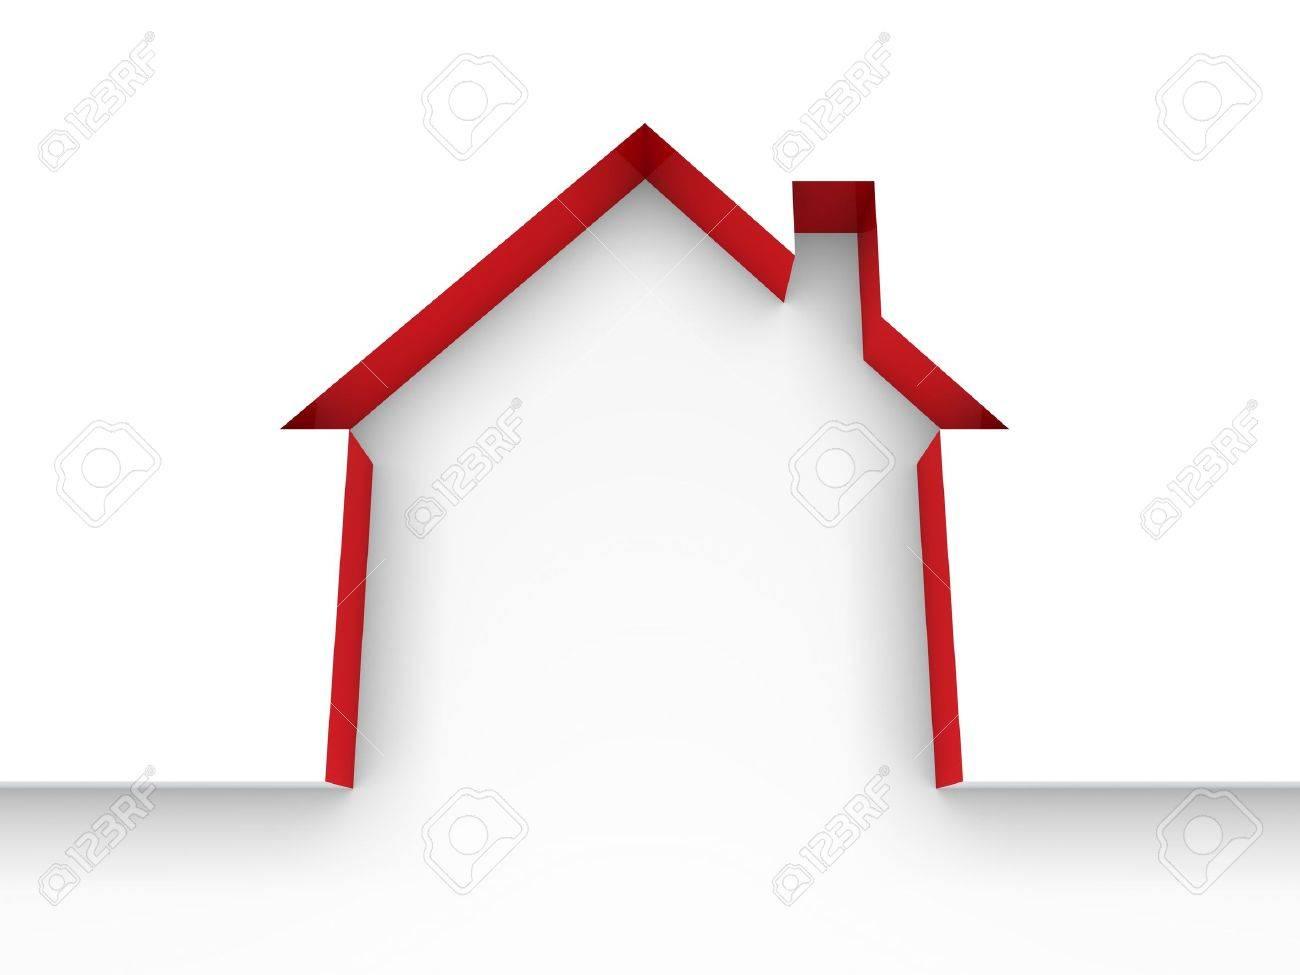 3d house estate red model home white - 10495154